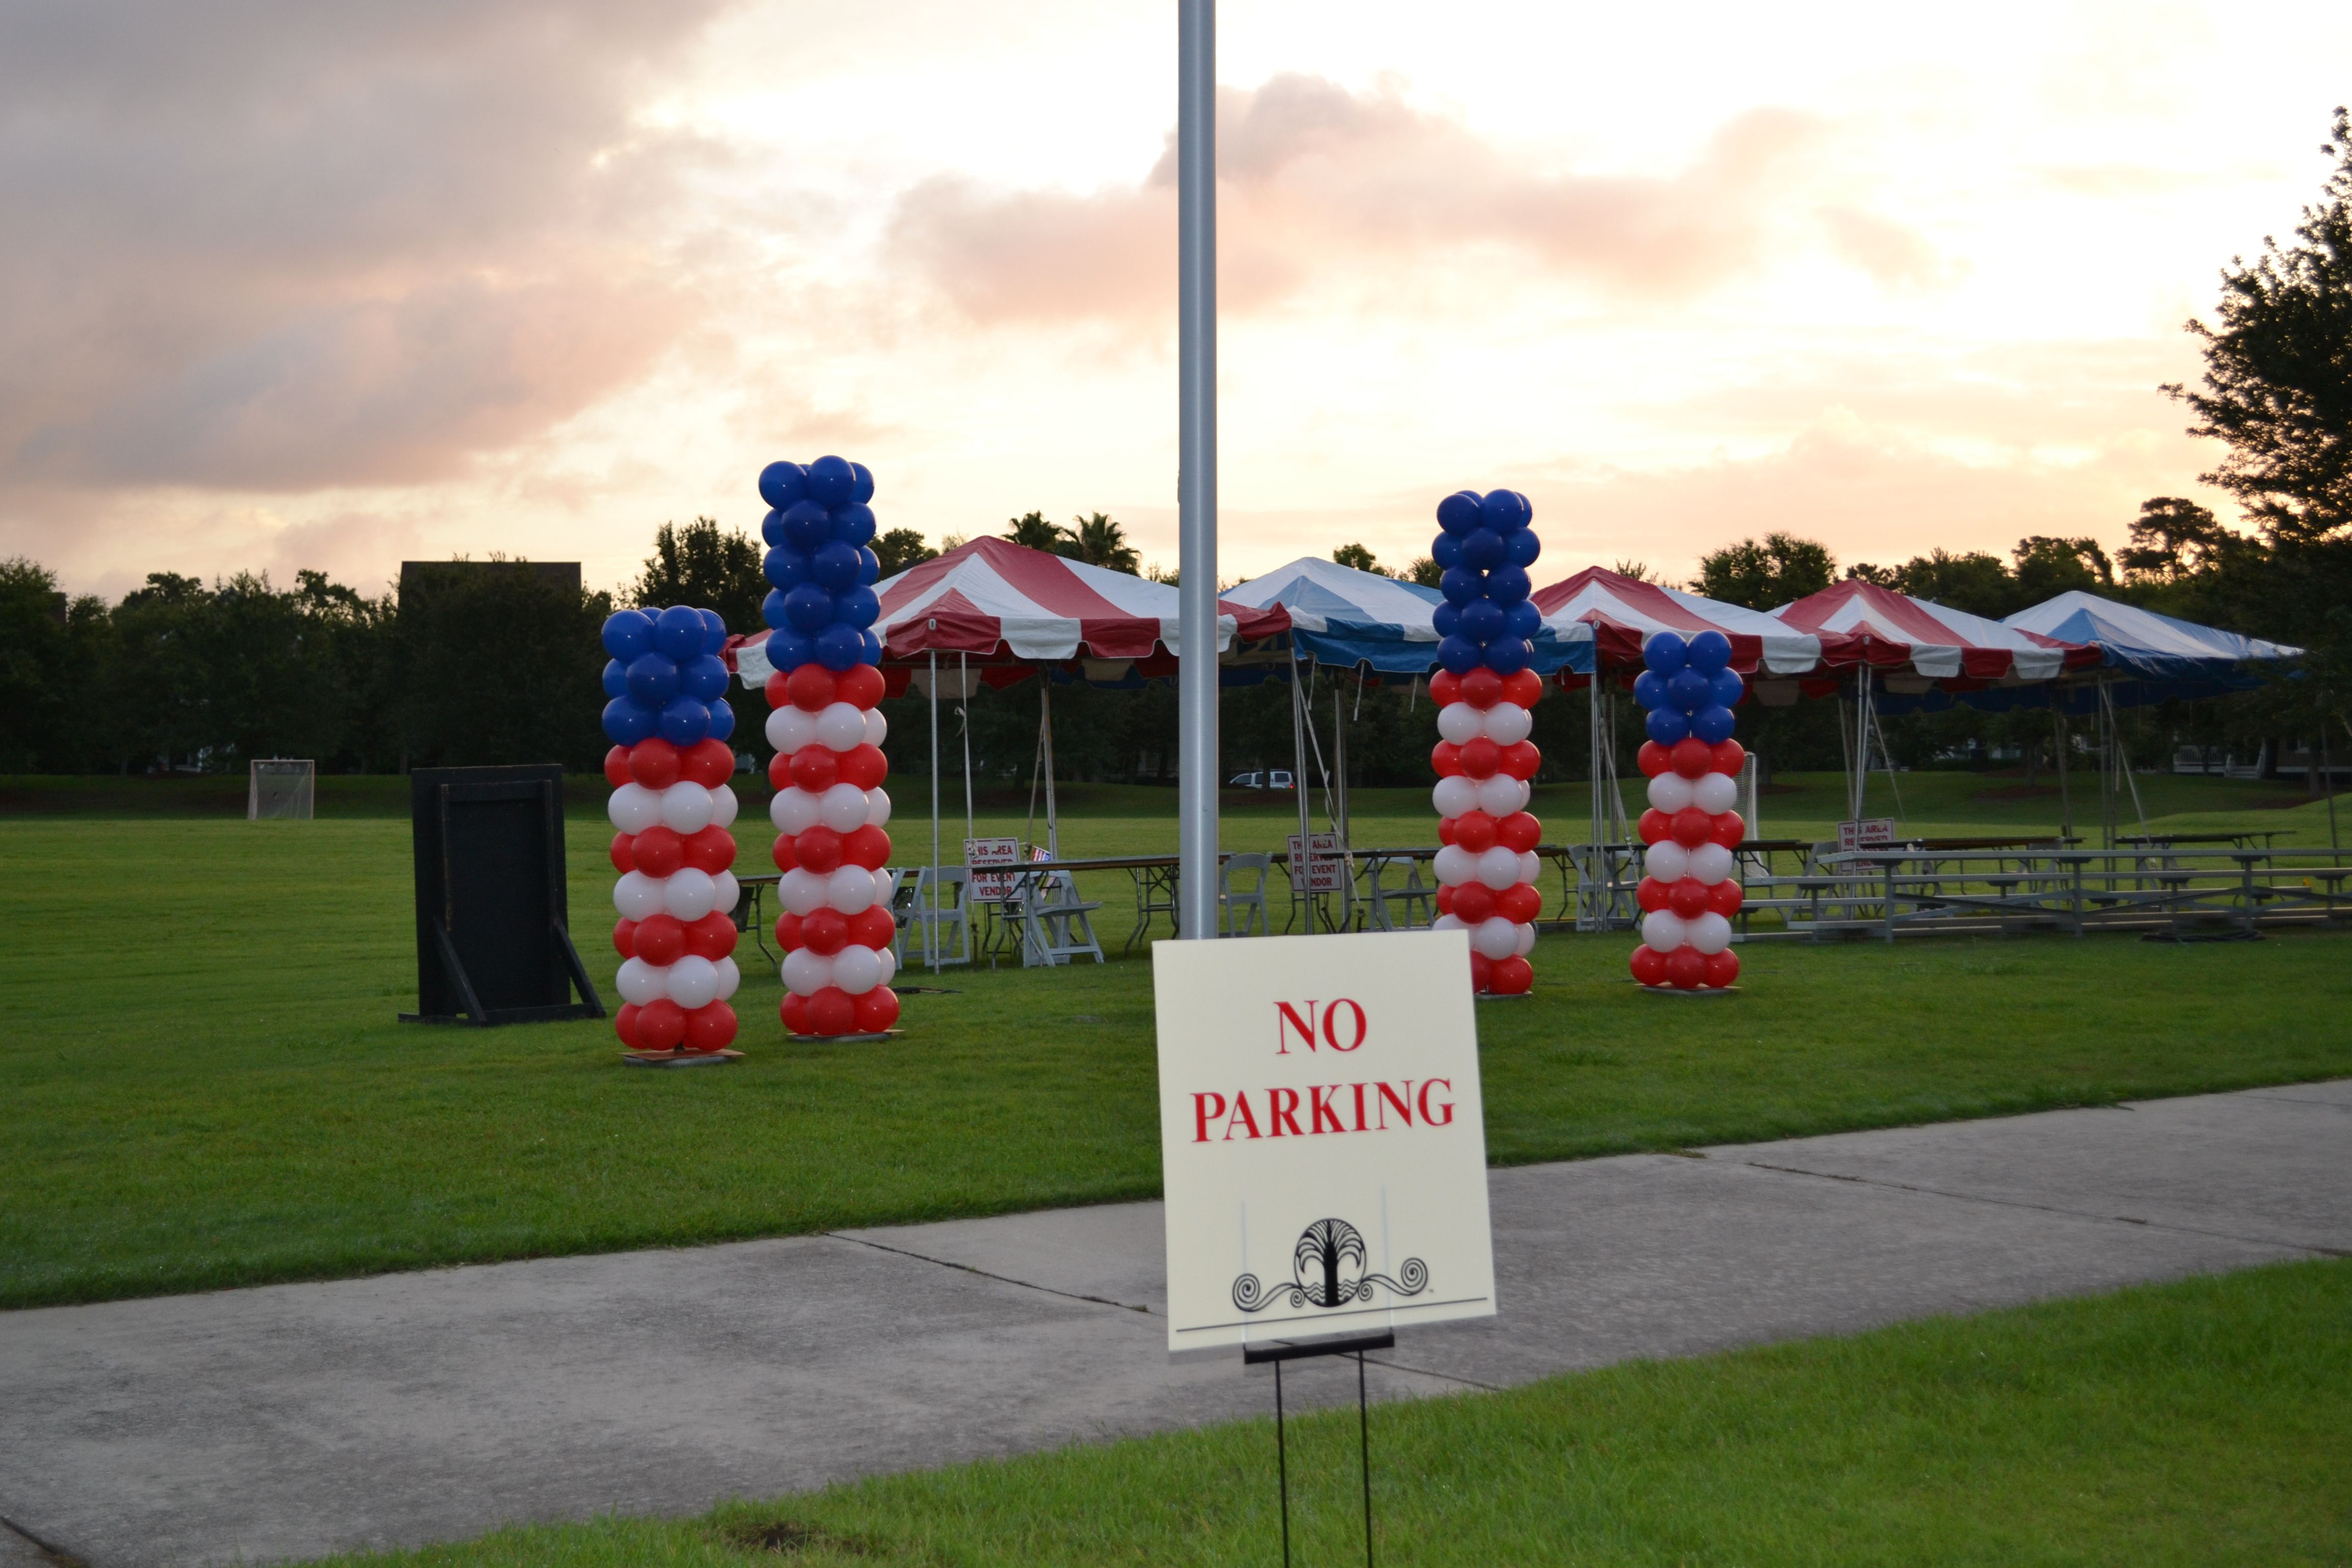 Patriotic Balloon Columns for July 4th Celebration at Daniel Island. www.CharlestonBalloonCompany.com